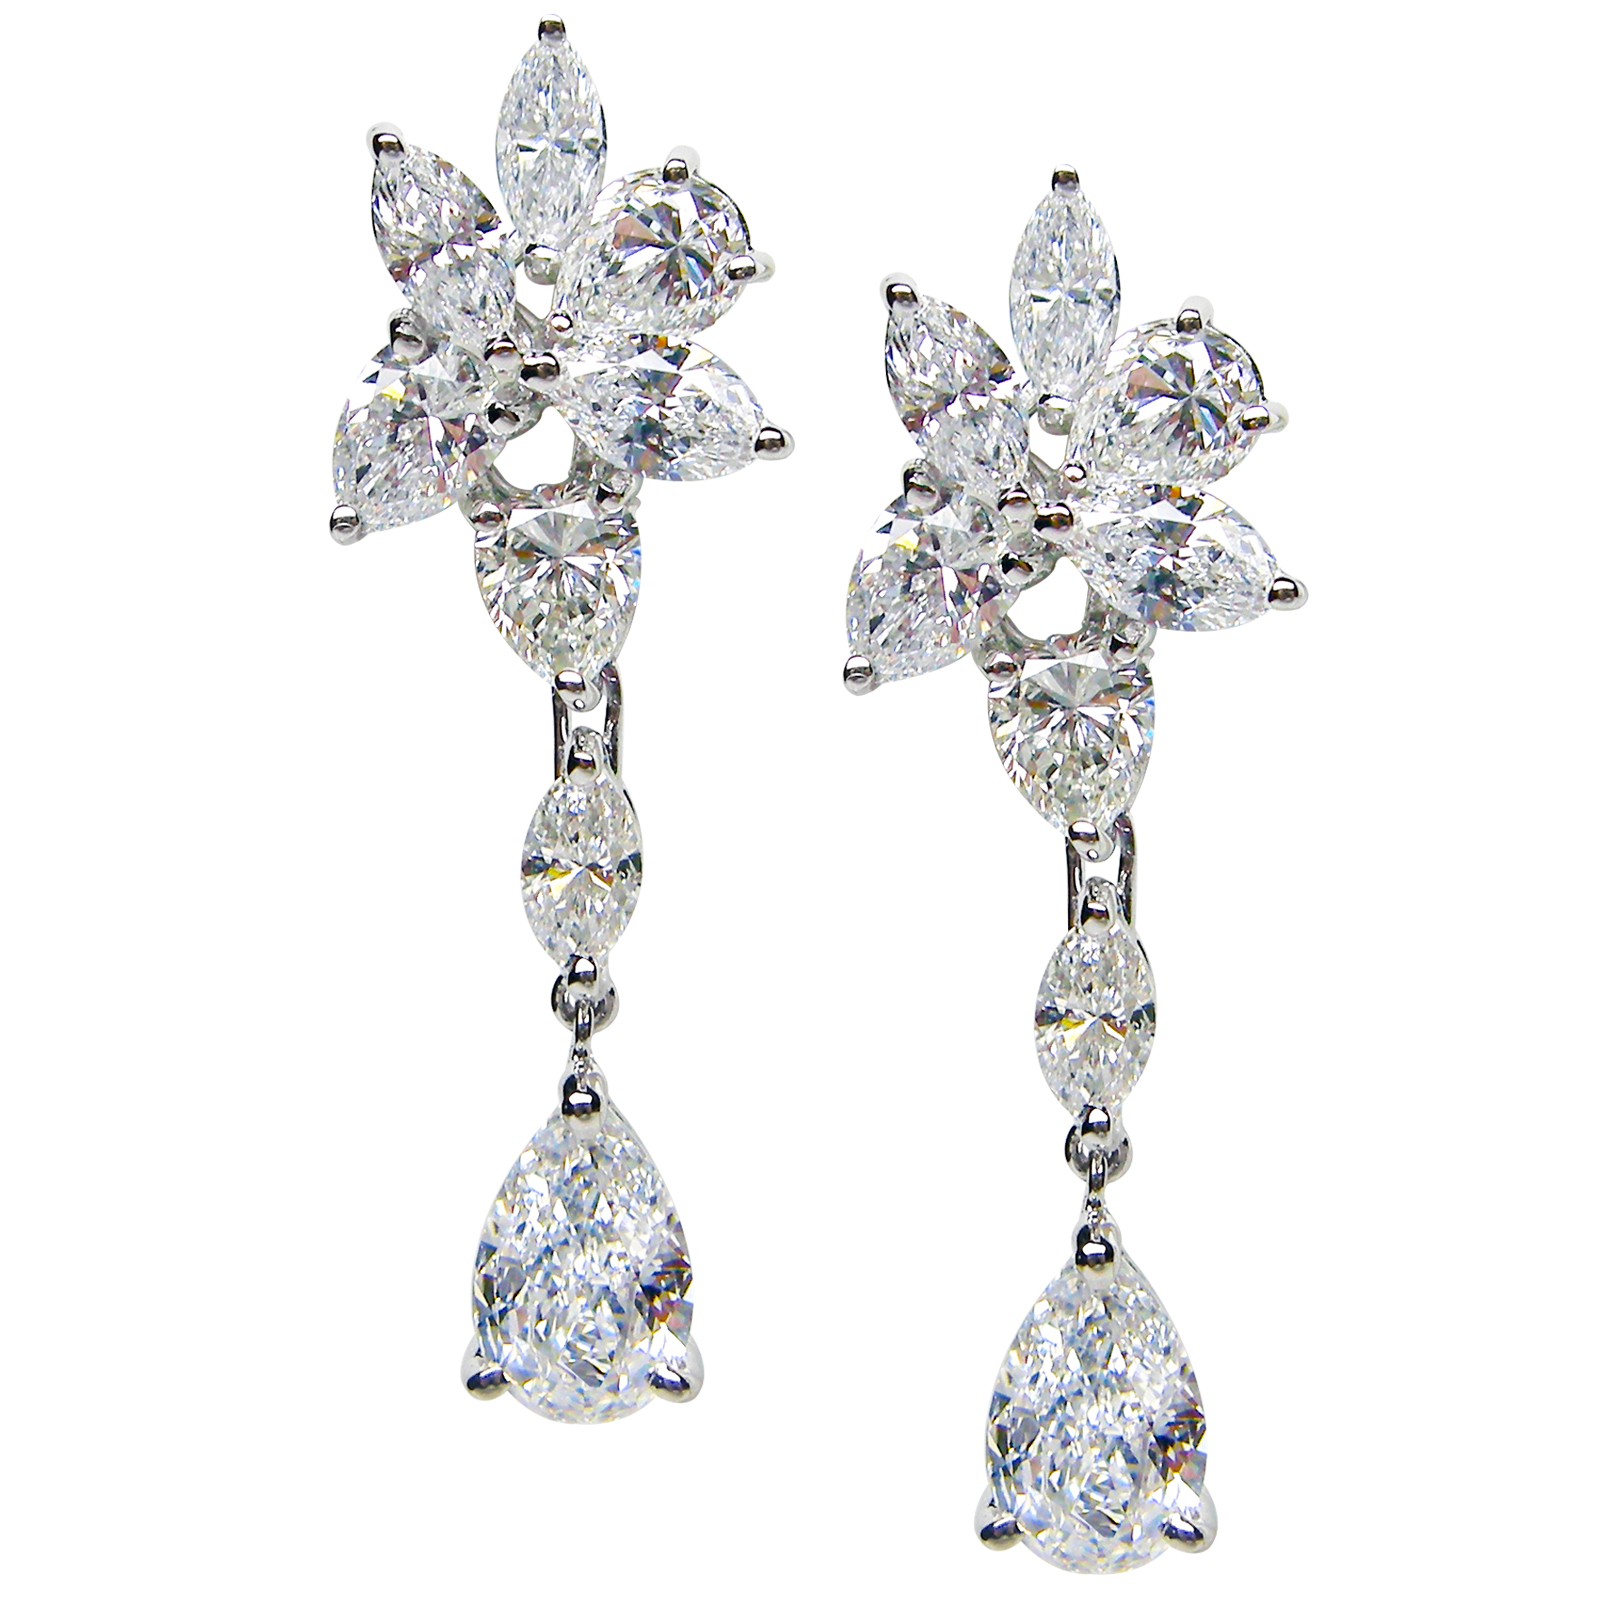 DIAMOND CLUSTER DROP WARRINGS BESPOKE FINE JEWELLERY BY SHAHINA HATTA